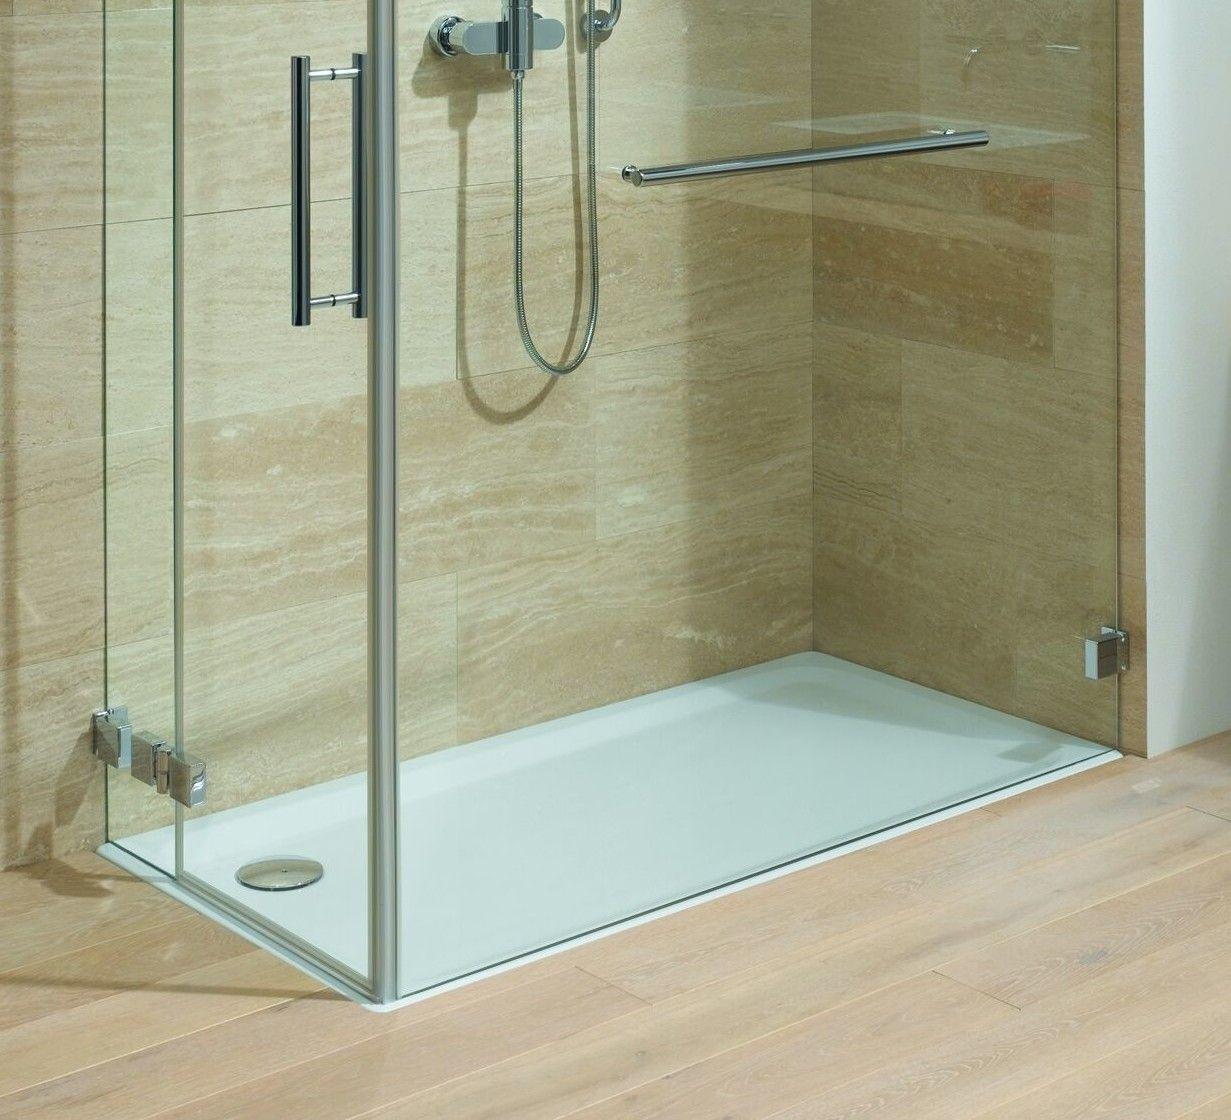 Superplan Xxl 59 X 30 Shower Base Shower Base Shower Tray Shower Wall Kits